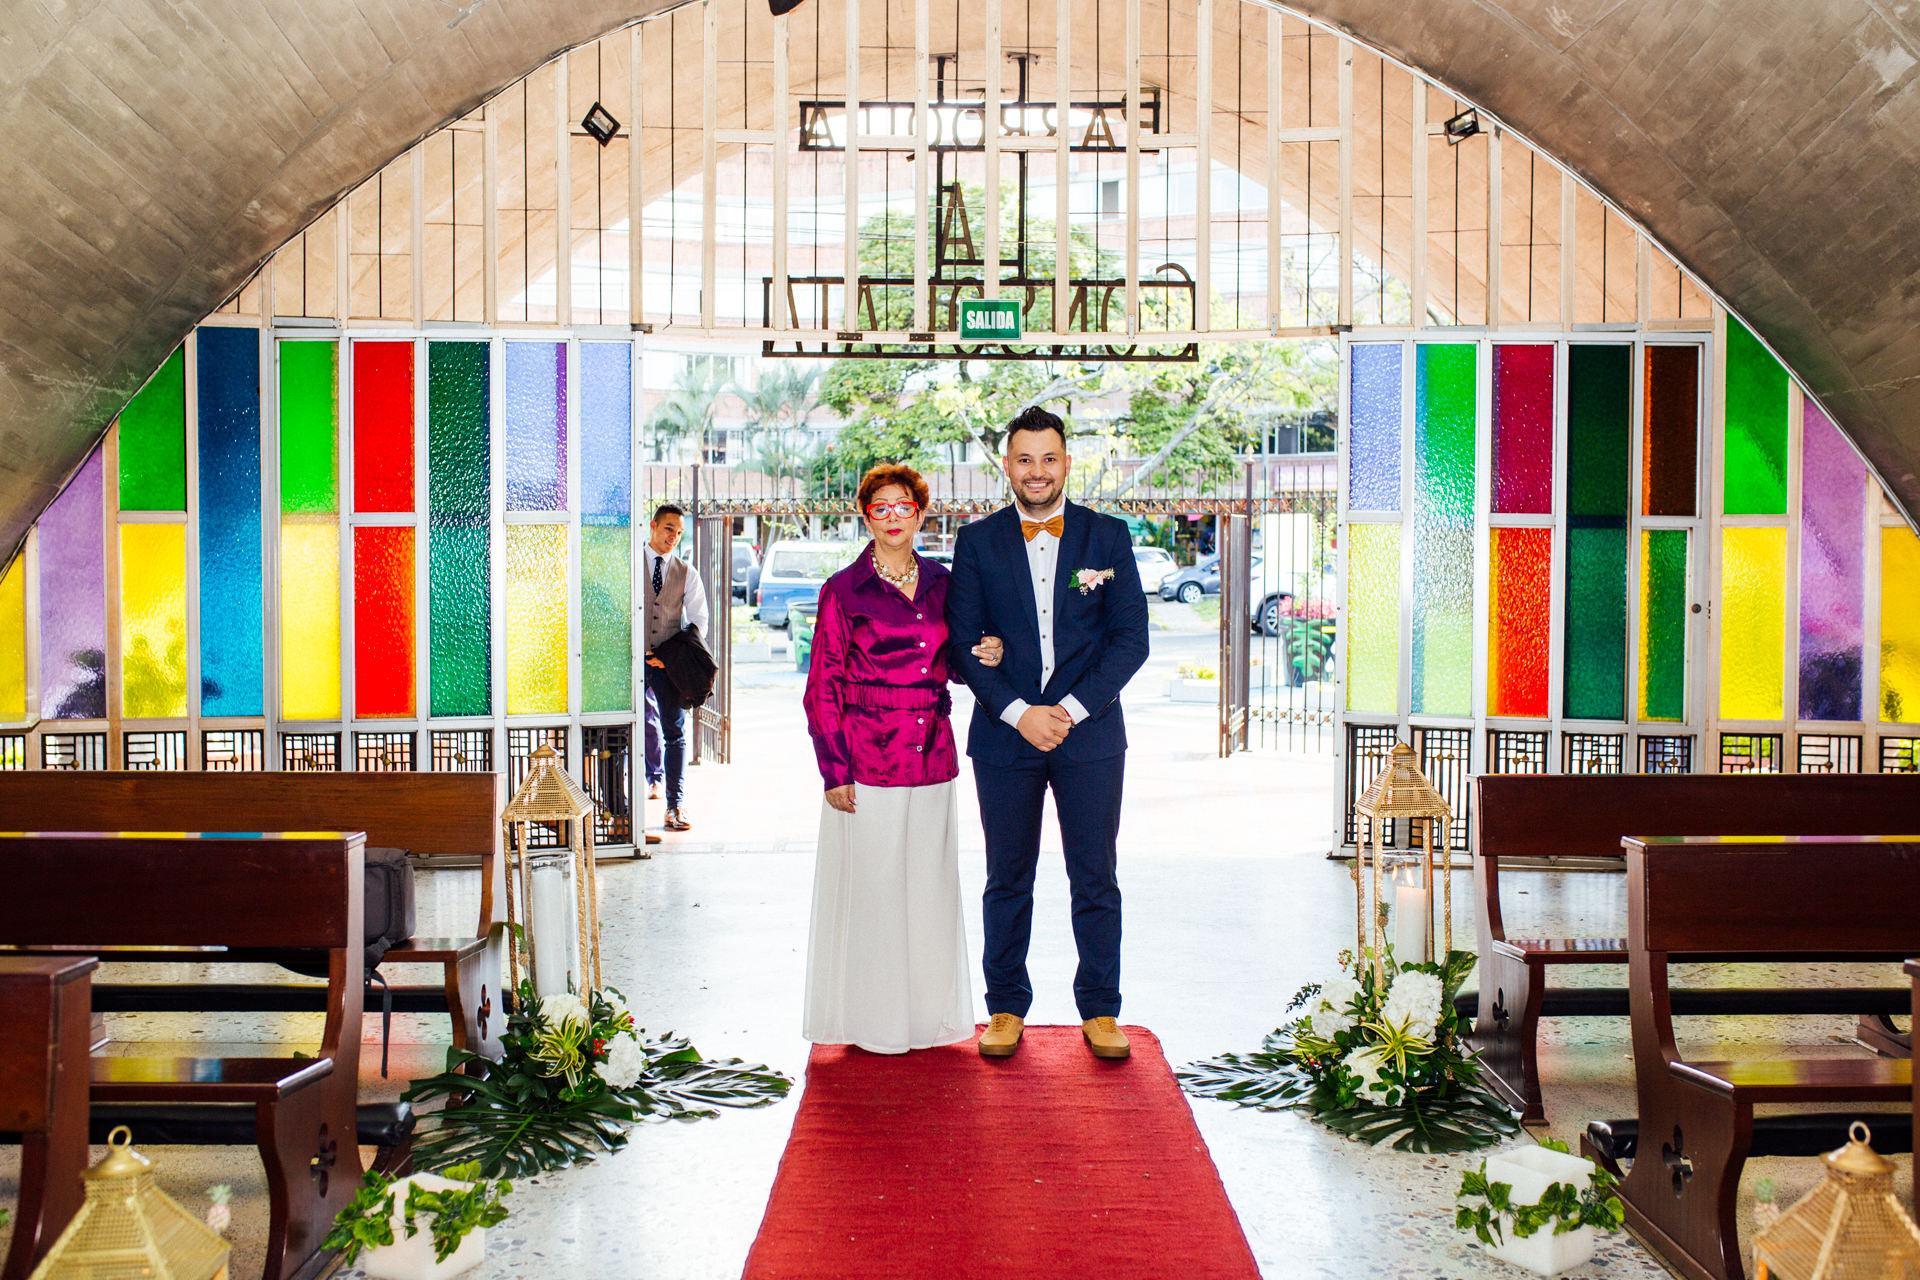 Wedding-Boda-Matrimonio-Fotografo-Fotografia-bodas-Medellin-Llanogrande-Colombia-Bogota-Cartagena-Miami-Wed-Destination-Photojournalism (80).JPG